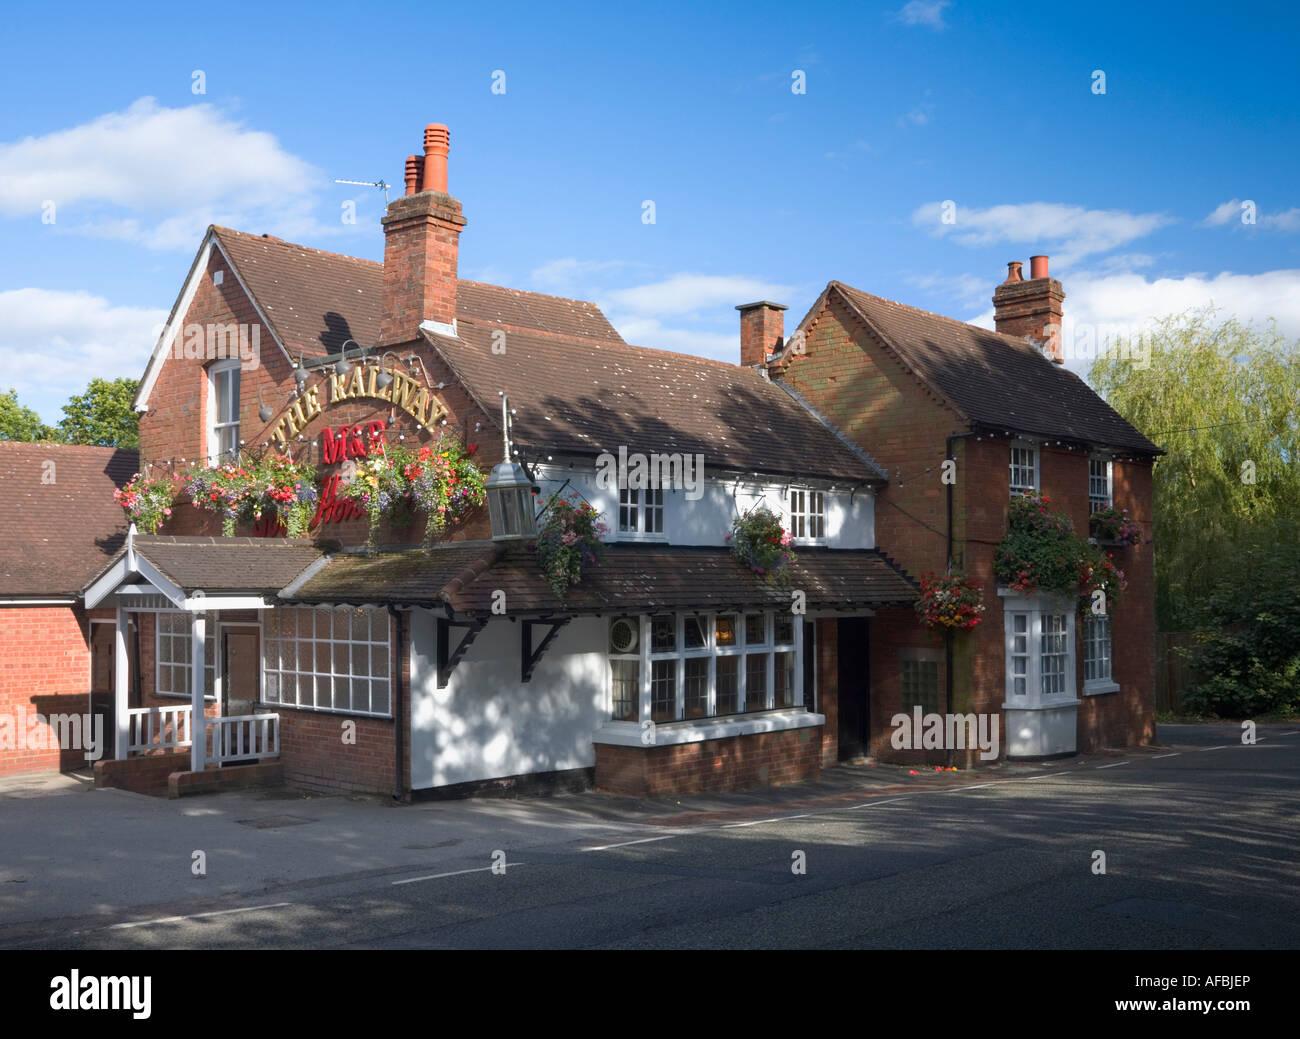 The Railway Inn near Dorridge West Midlands England - Stock Image